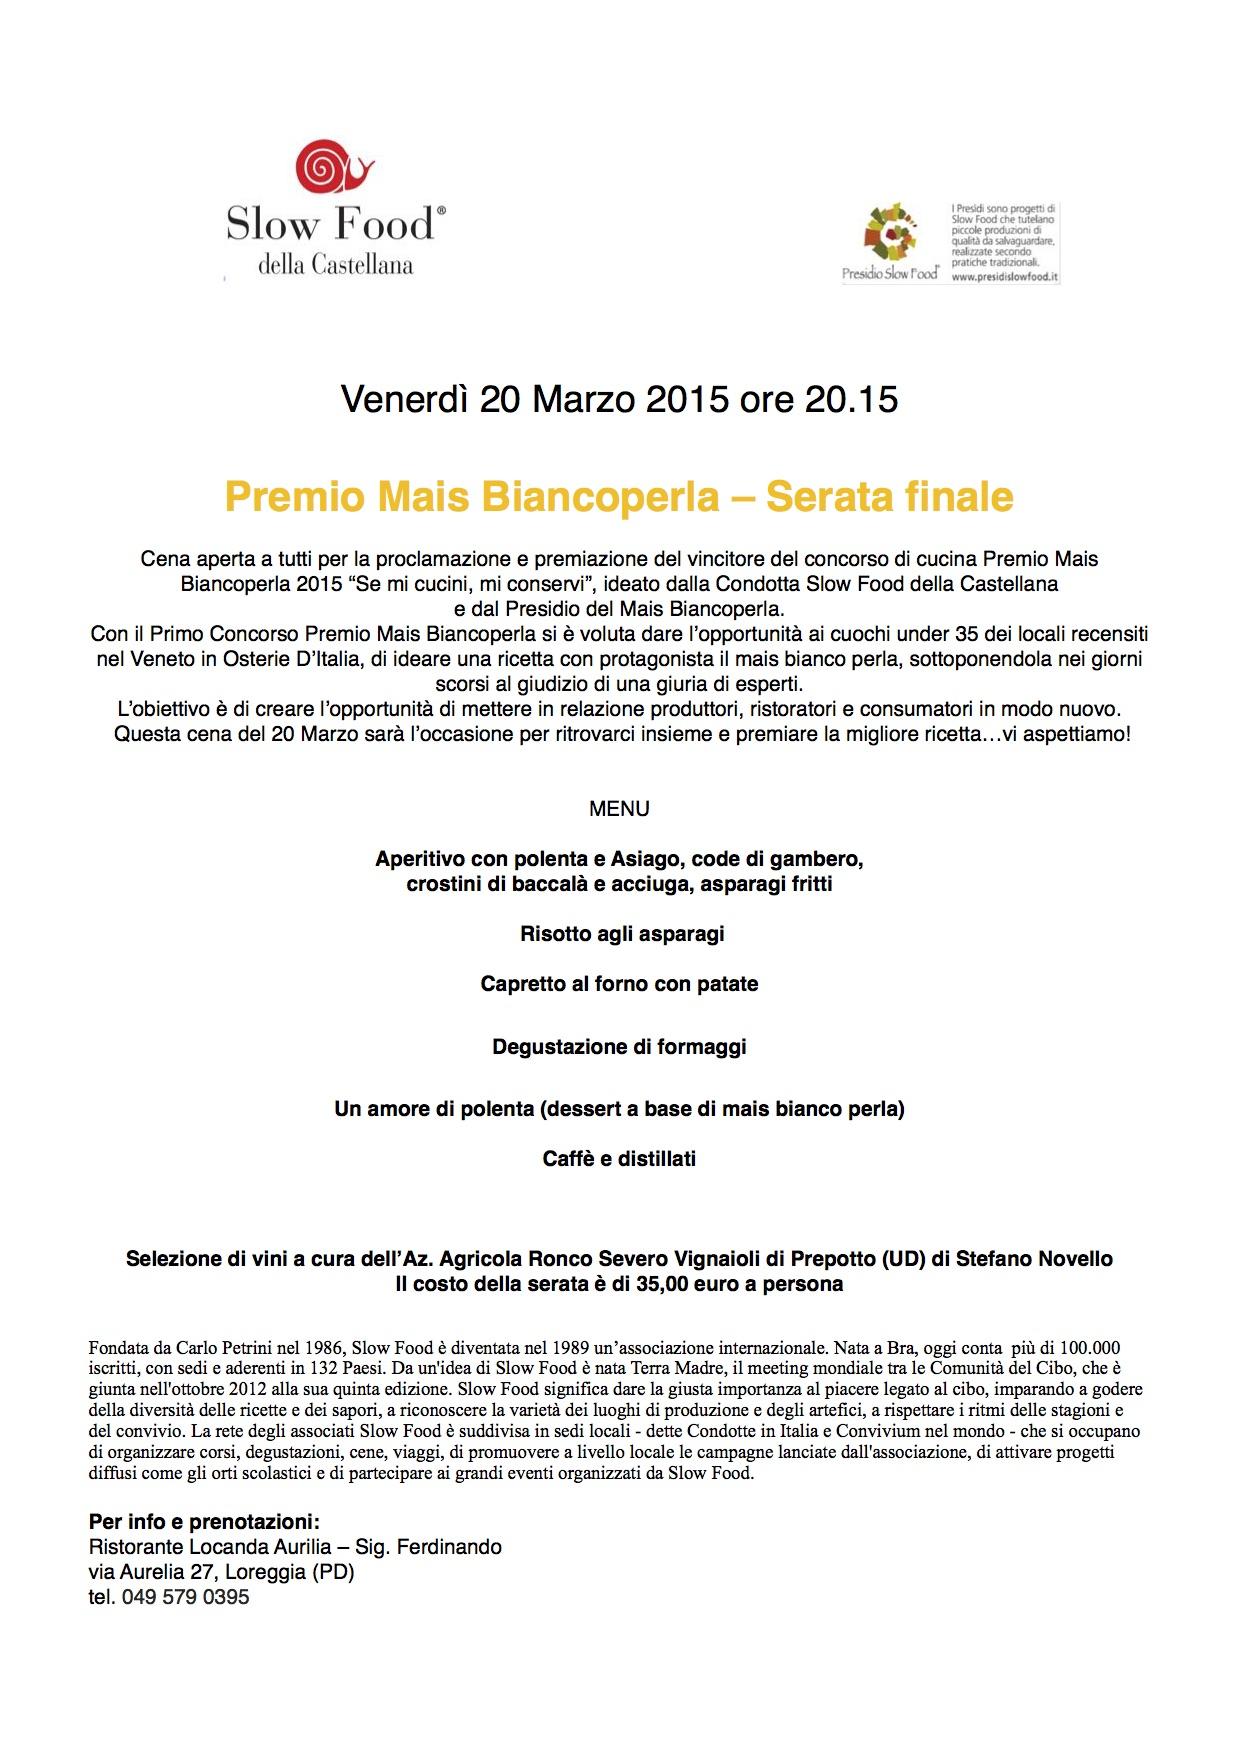 Premio-mais-biancperla-serata-finale-20-mar-2015.jpg